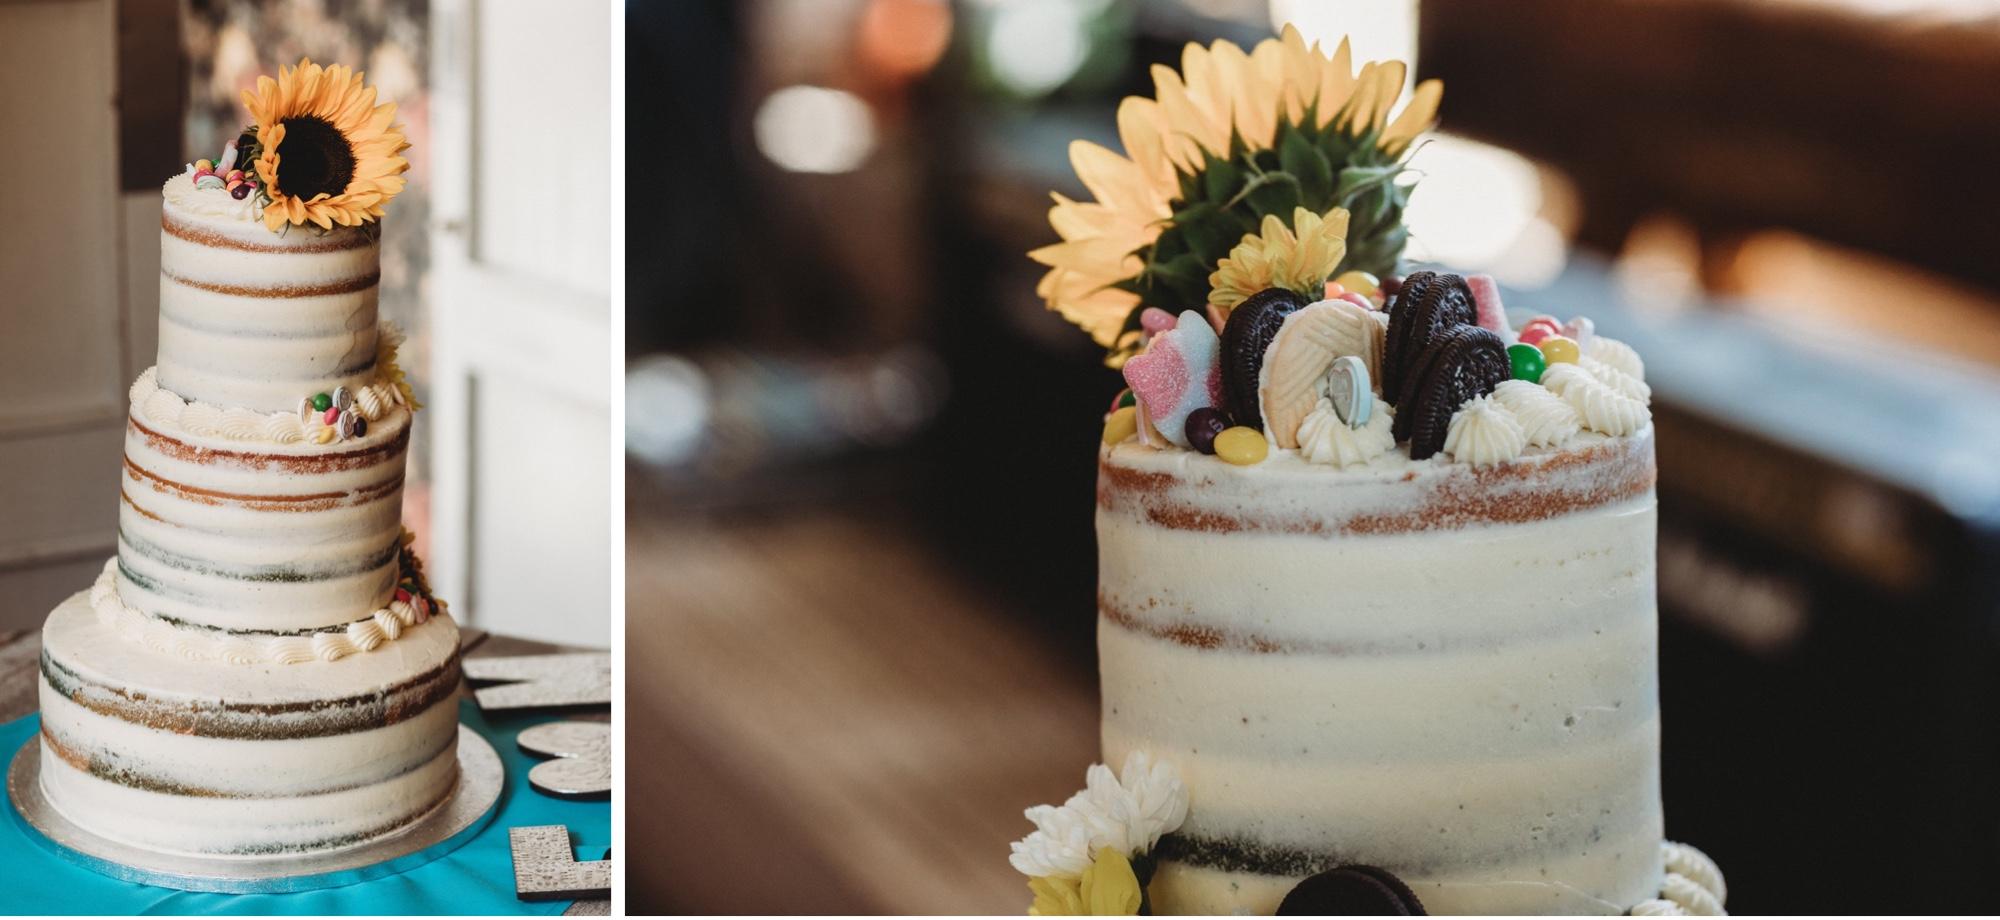 hackney London wedding vegan cake by zakas photography